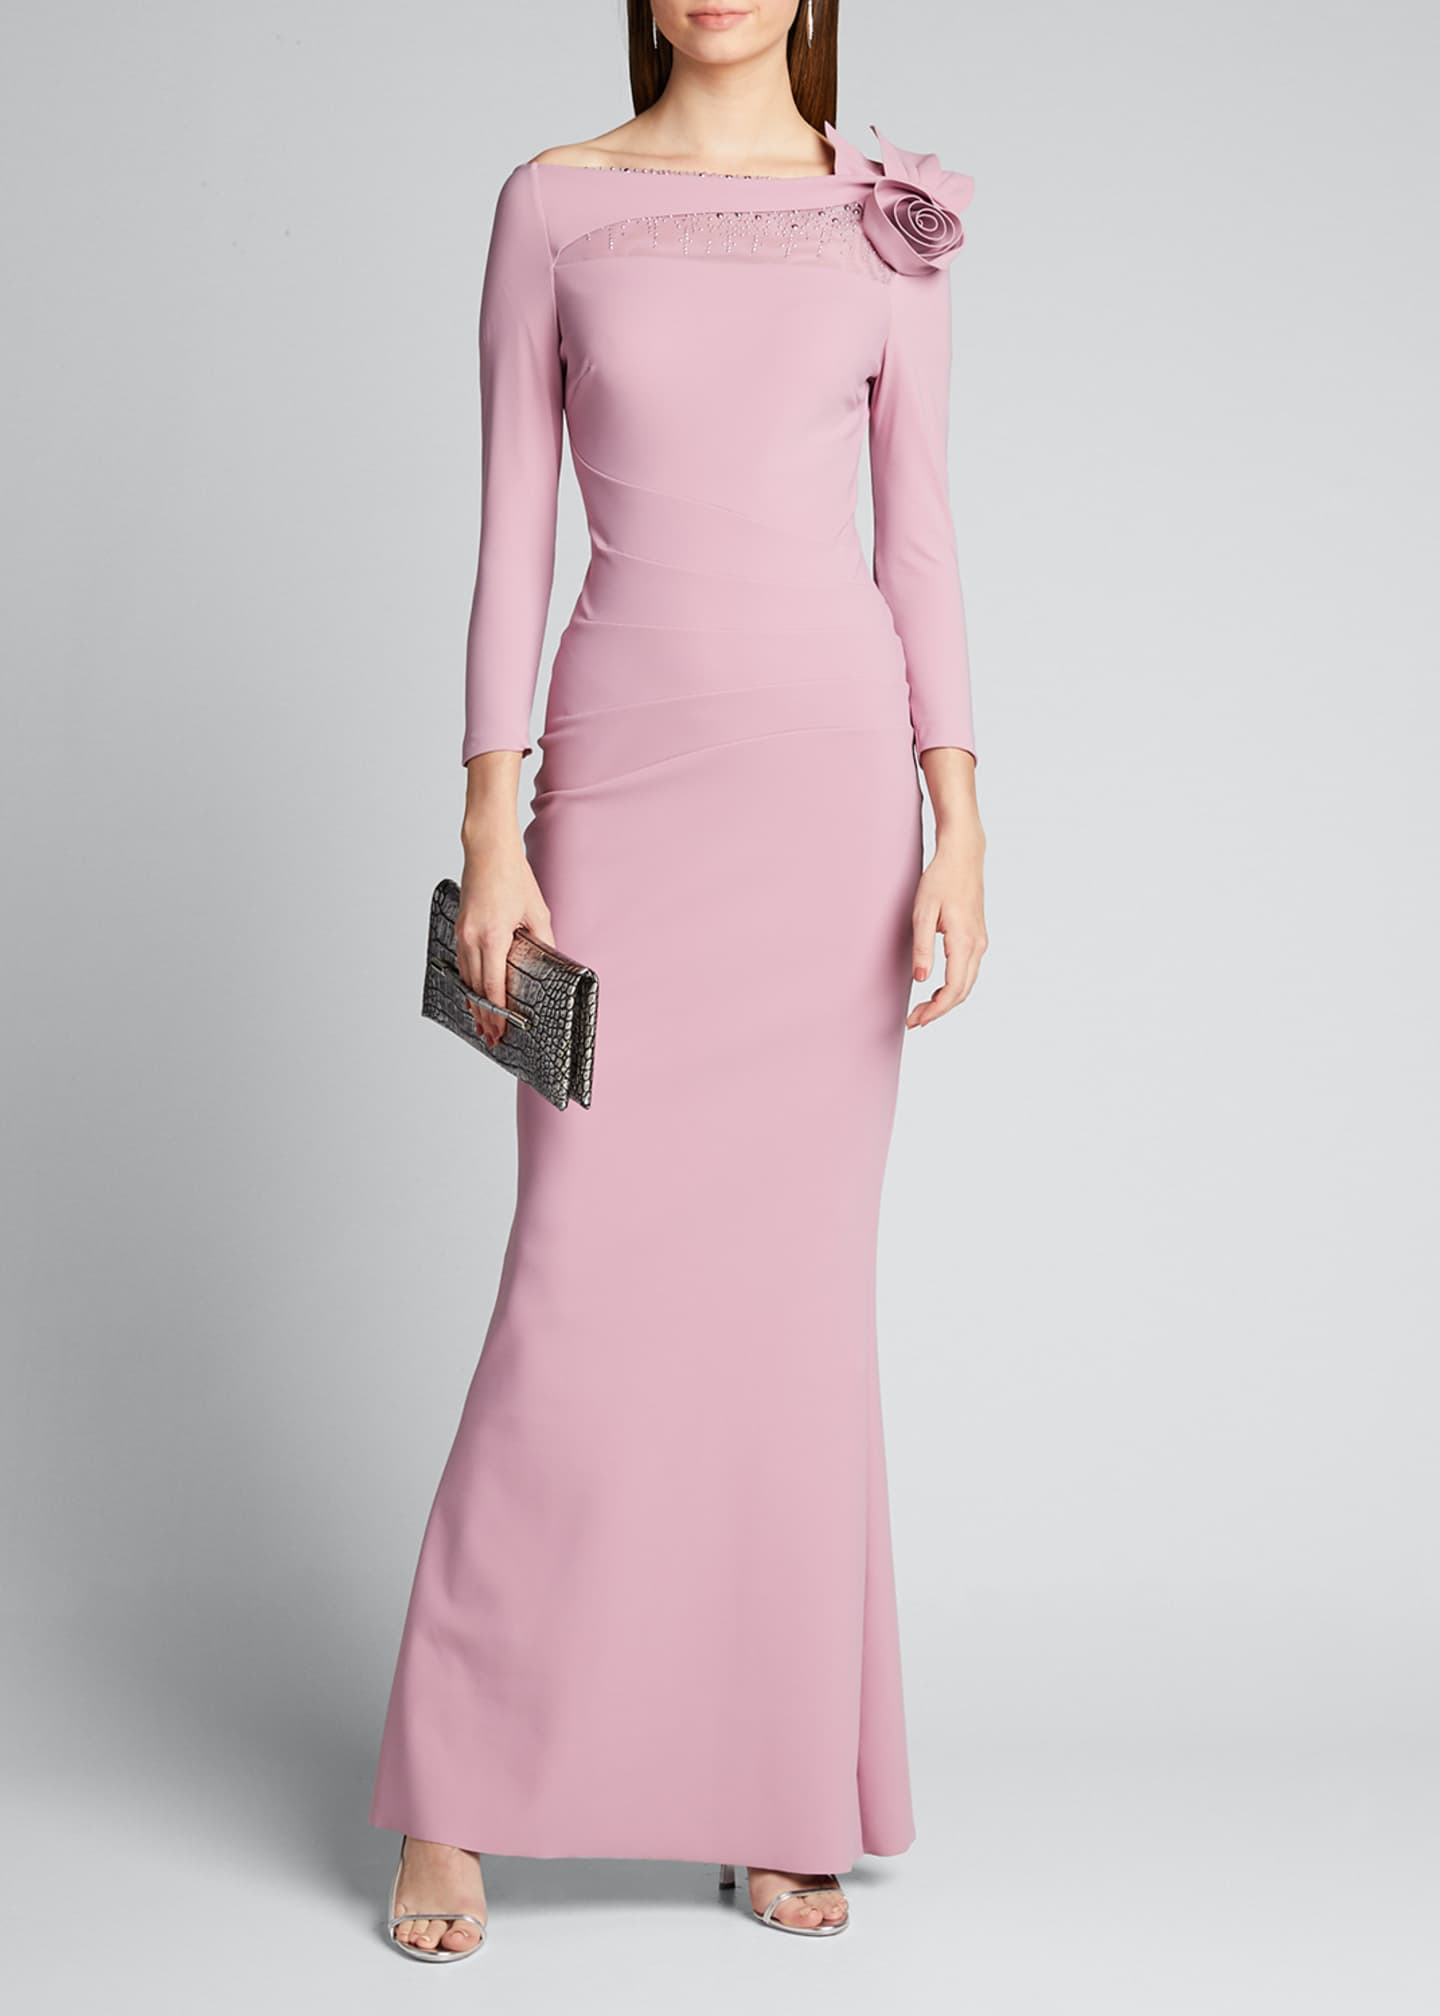 Chiara Boni La Petite Robe High-Neck 3/4-Sleeve Gown